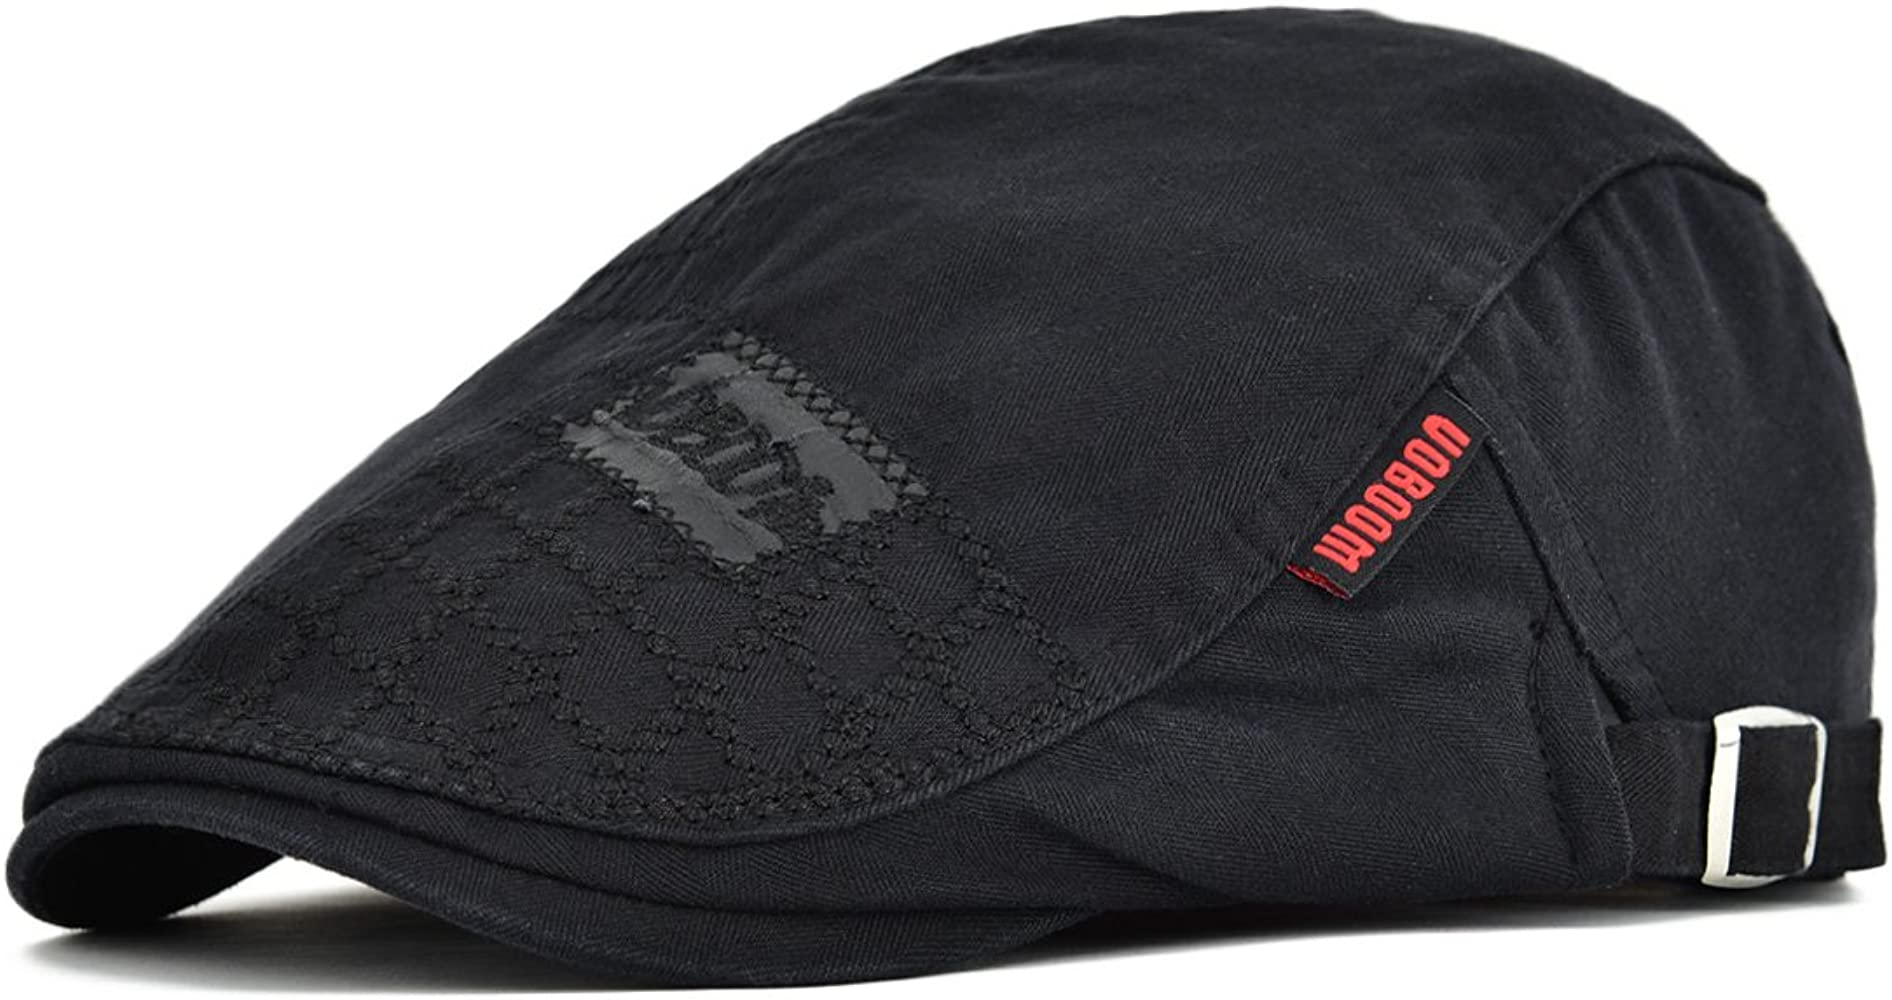 LouisBerry Rage Against The Machine Fashion Mesh Hat Adult Cap Unisex Summer Adjustable Black